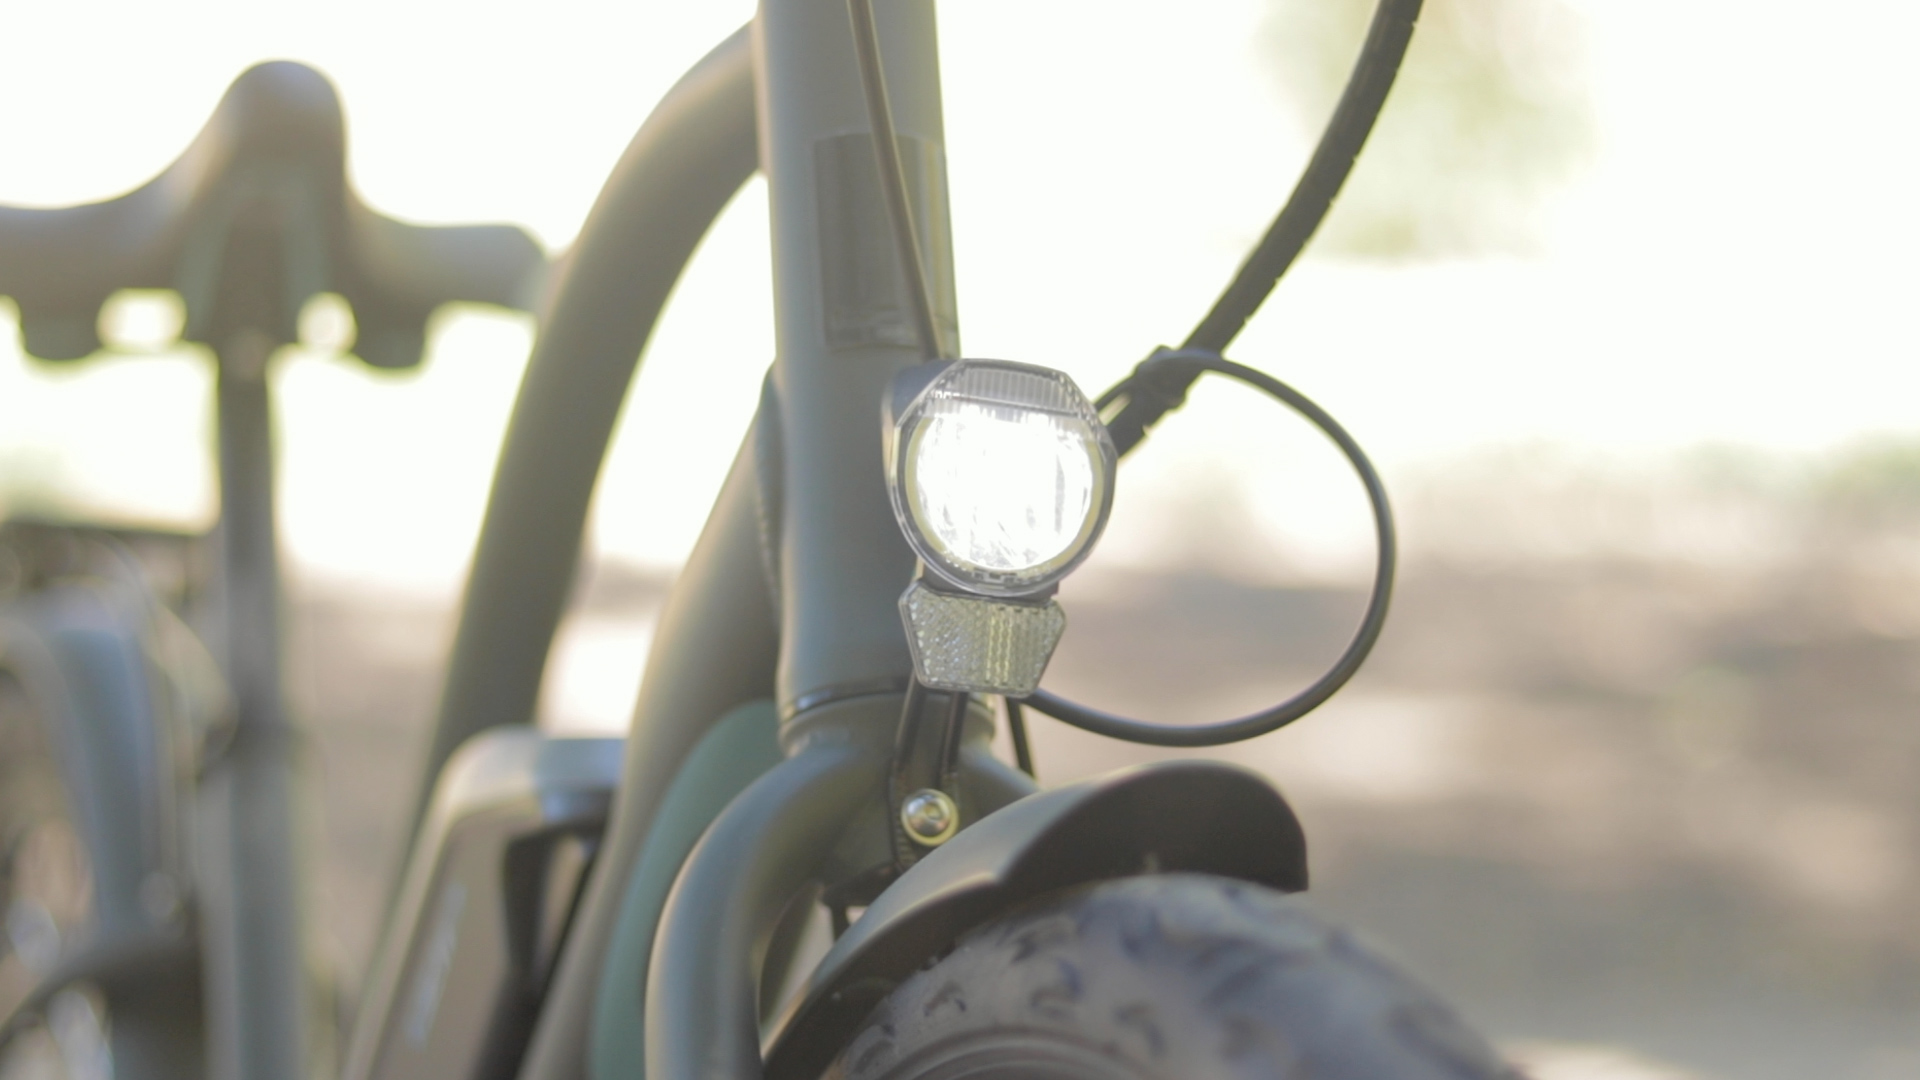 electrified-reviews-izip-simi-electric-bike-review-light.jpg